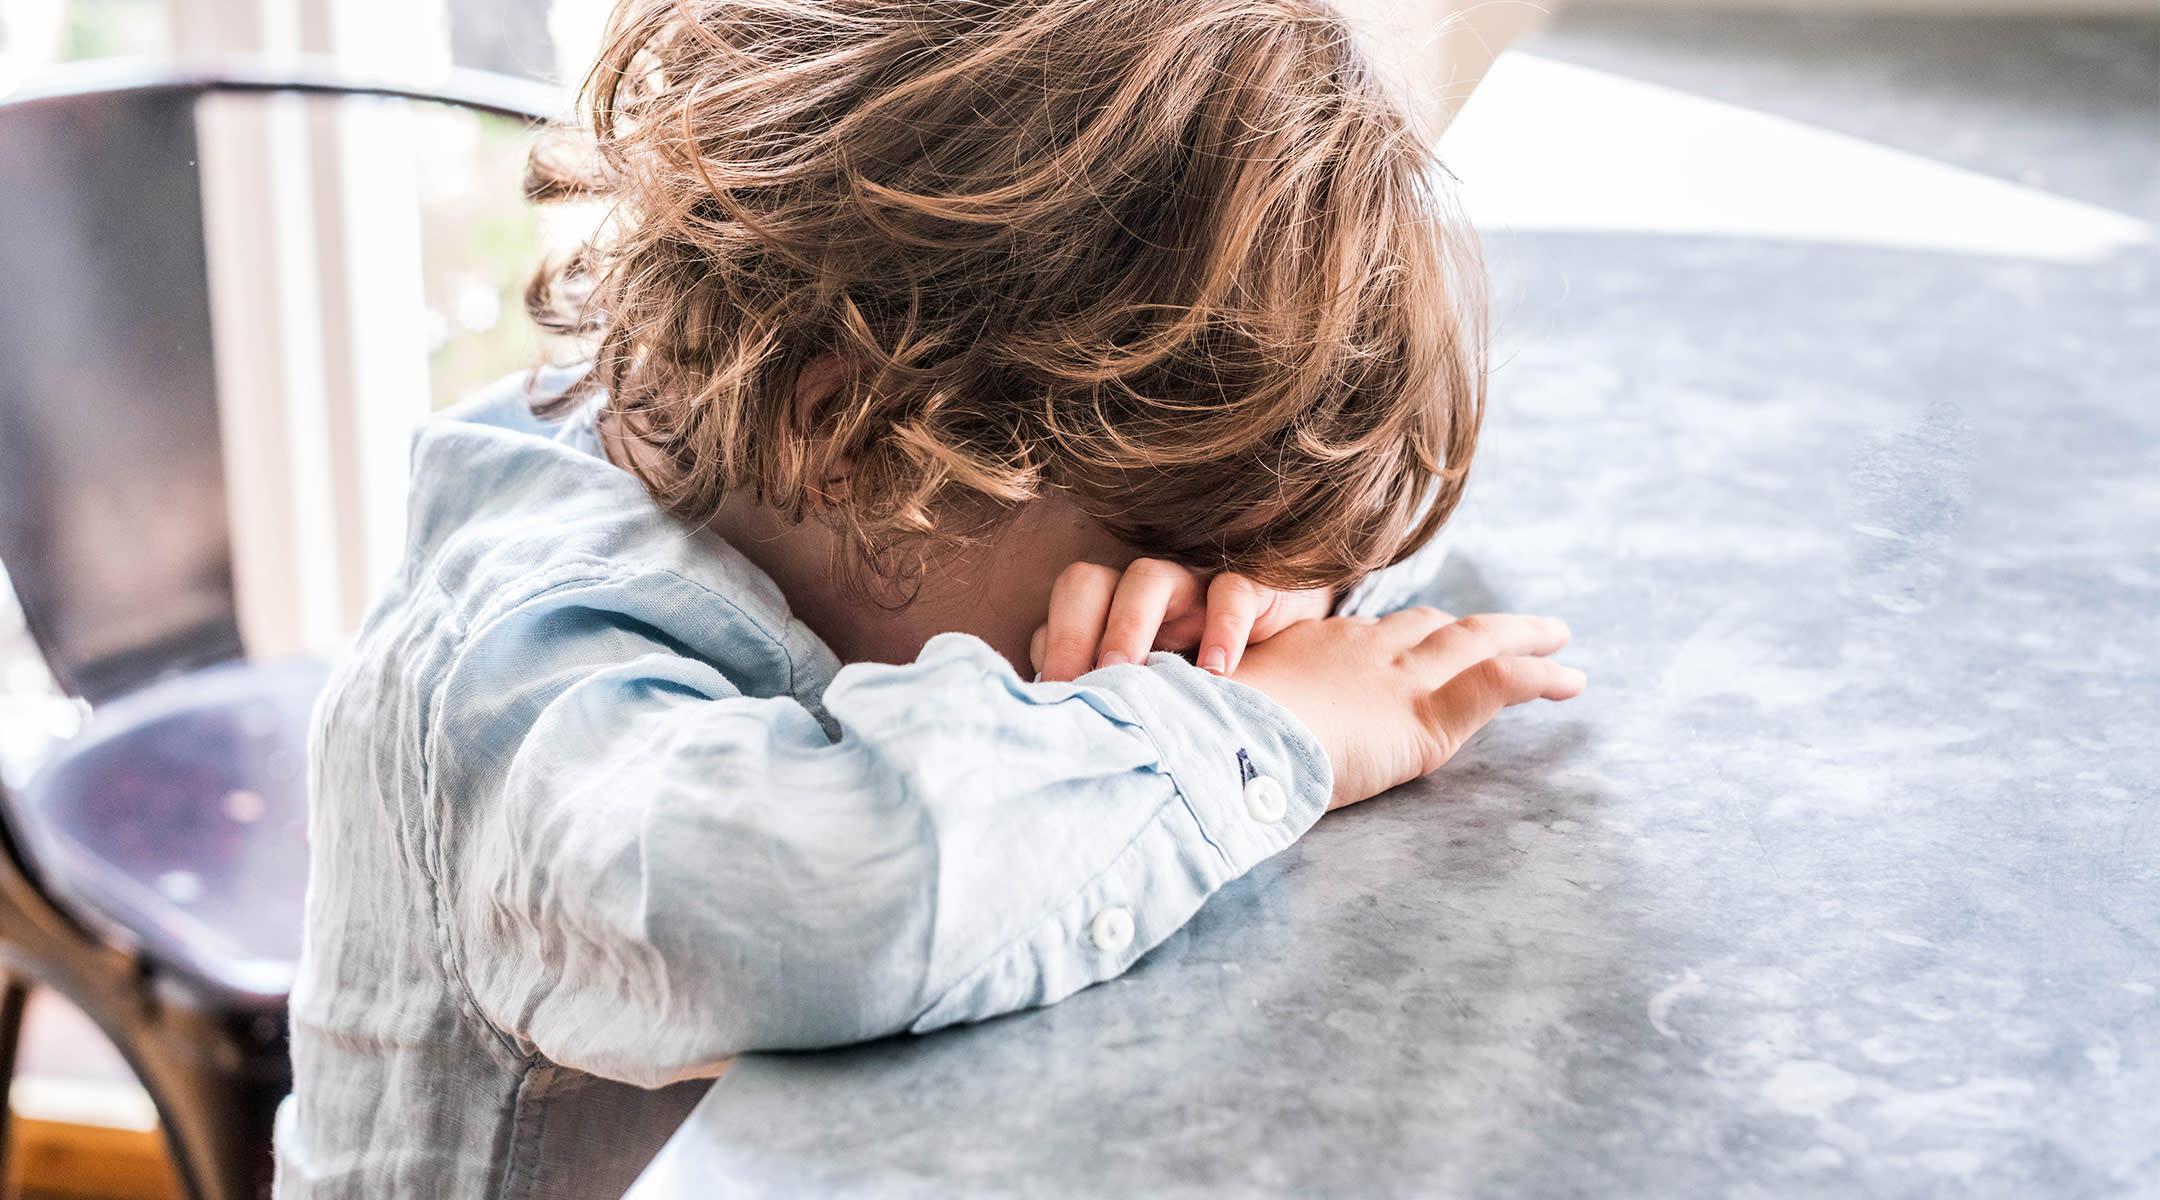 Pediatricians Strengthen Stance Against >> Pediatricians Strengthen Their Stance Against Spanking Kids